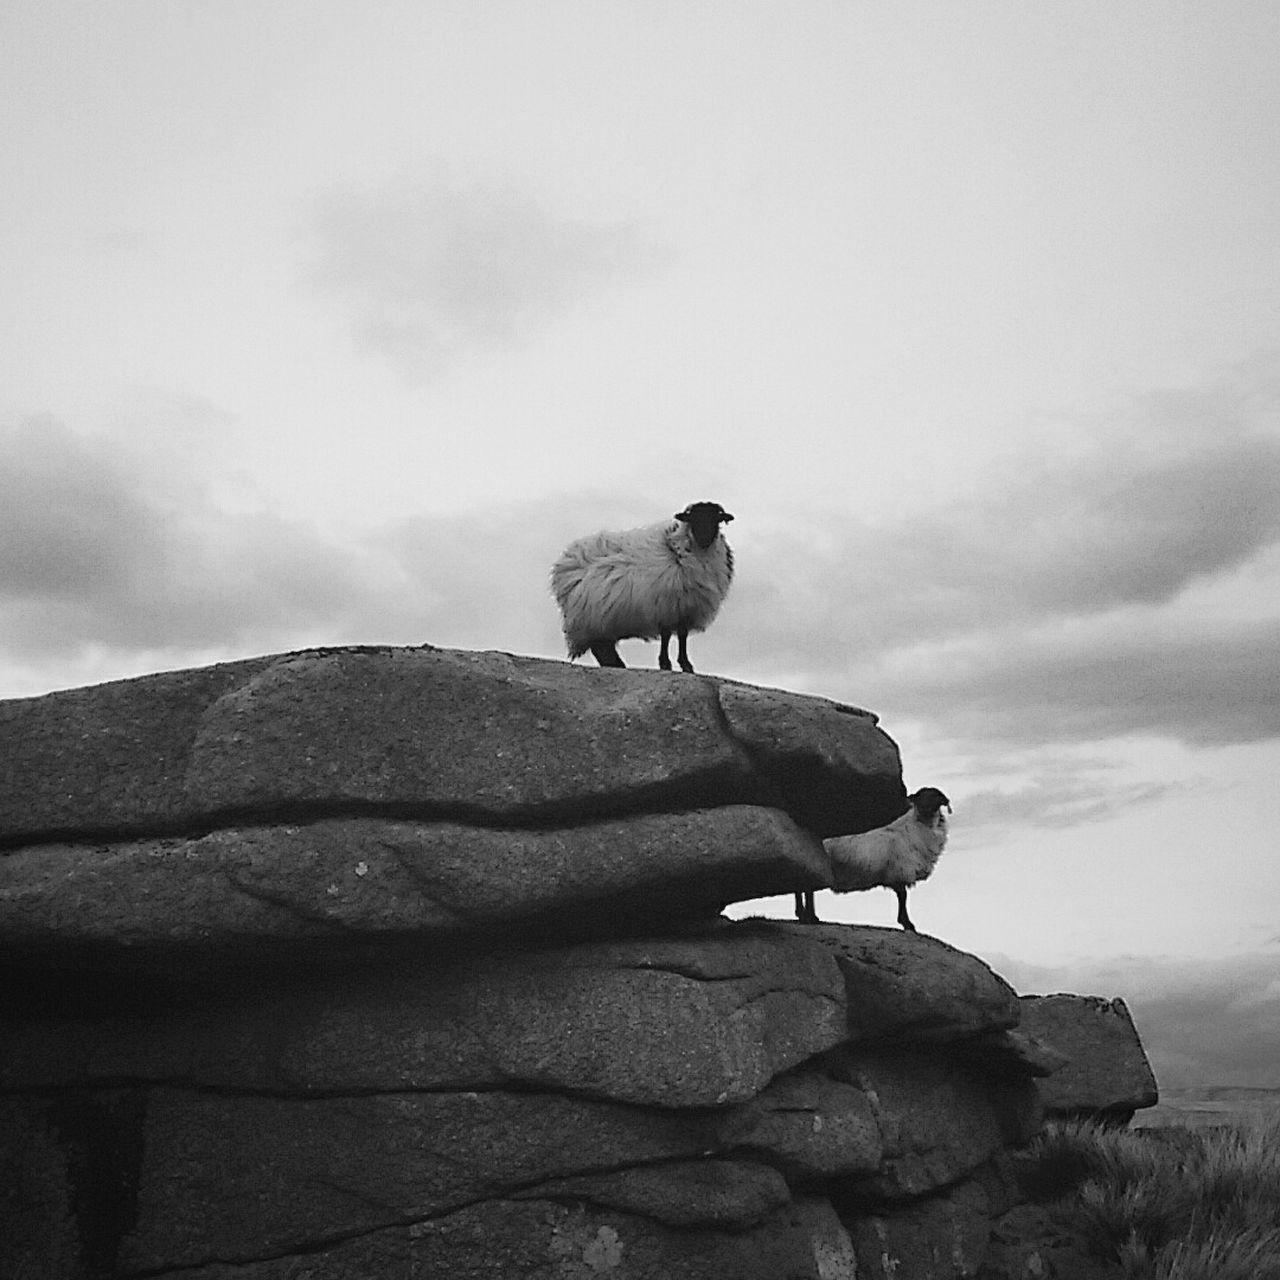 Sheep on the rock Sheep Rocks Dartmoor National Park Devon Nature Photography Nature_collection Annimals British Landscape